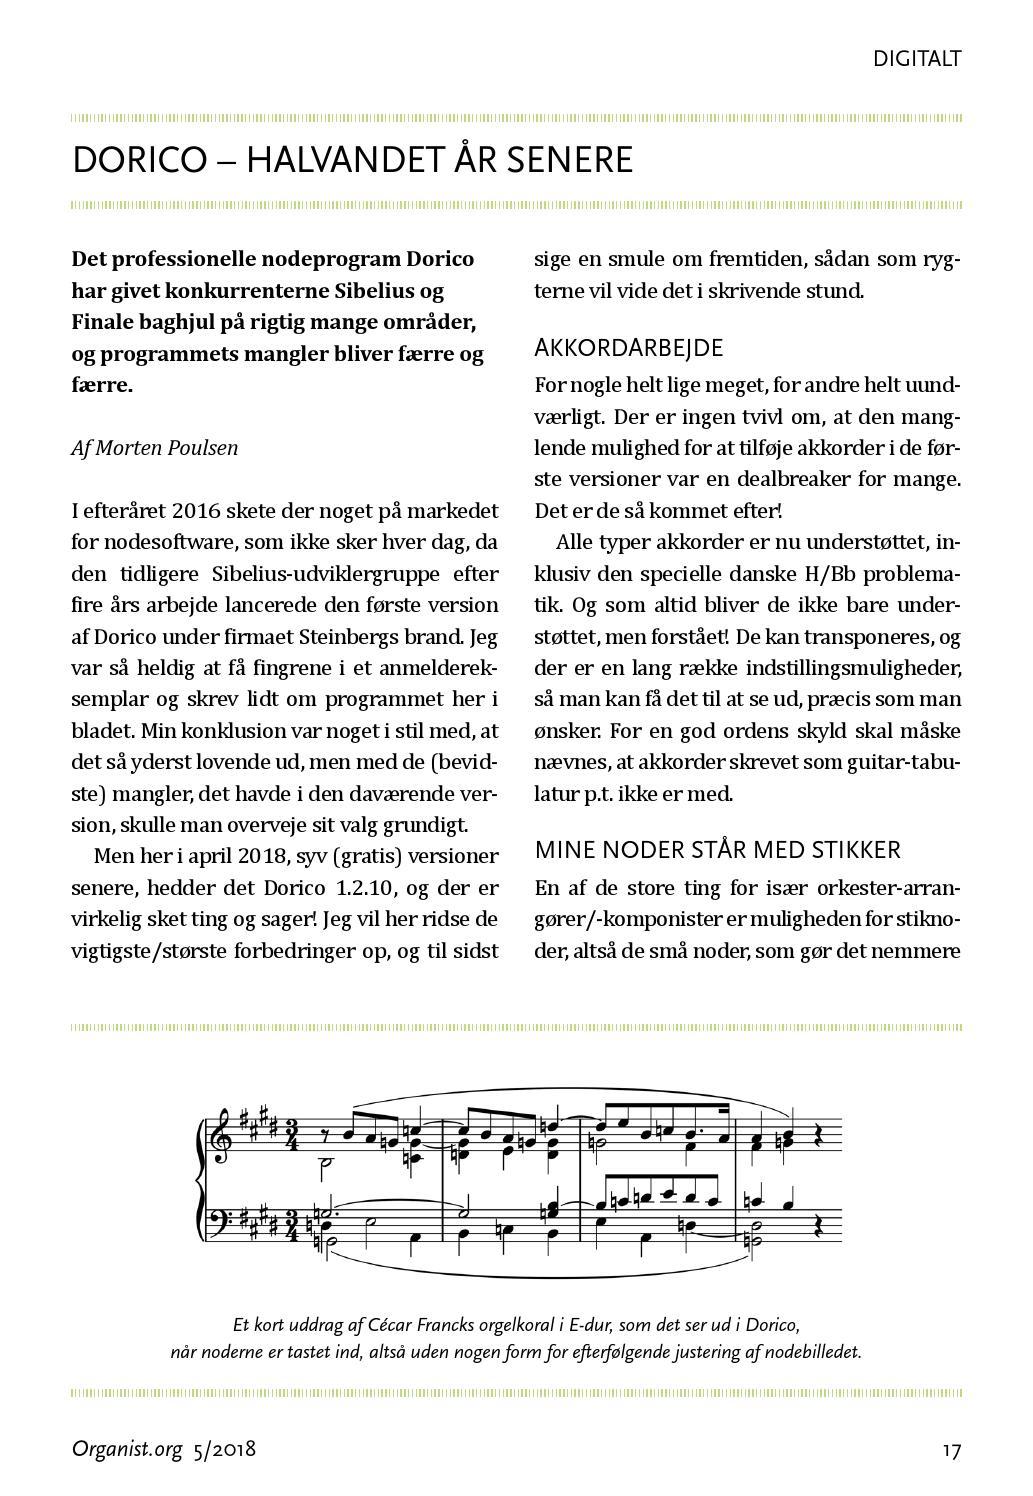 Organist org nr  5 2018 by Organistforeningens fagblad - issuu